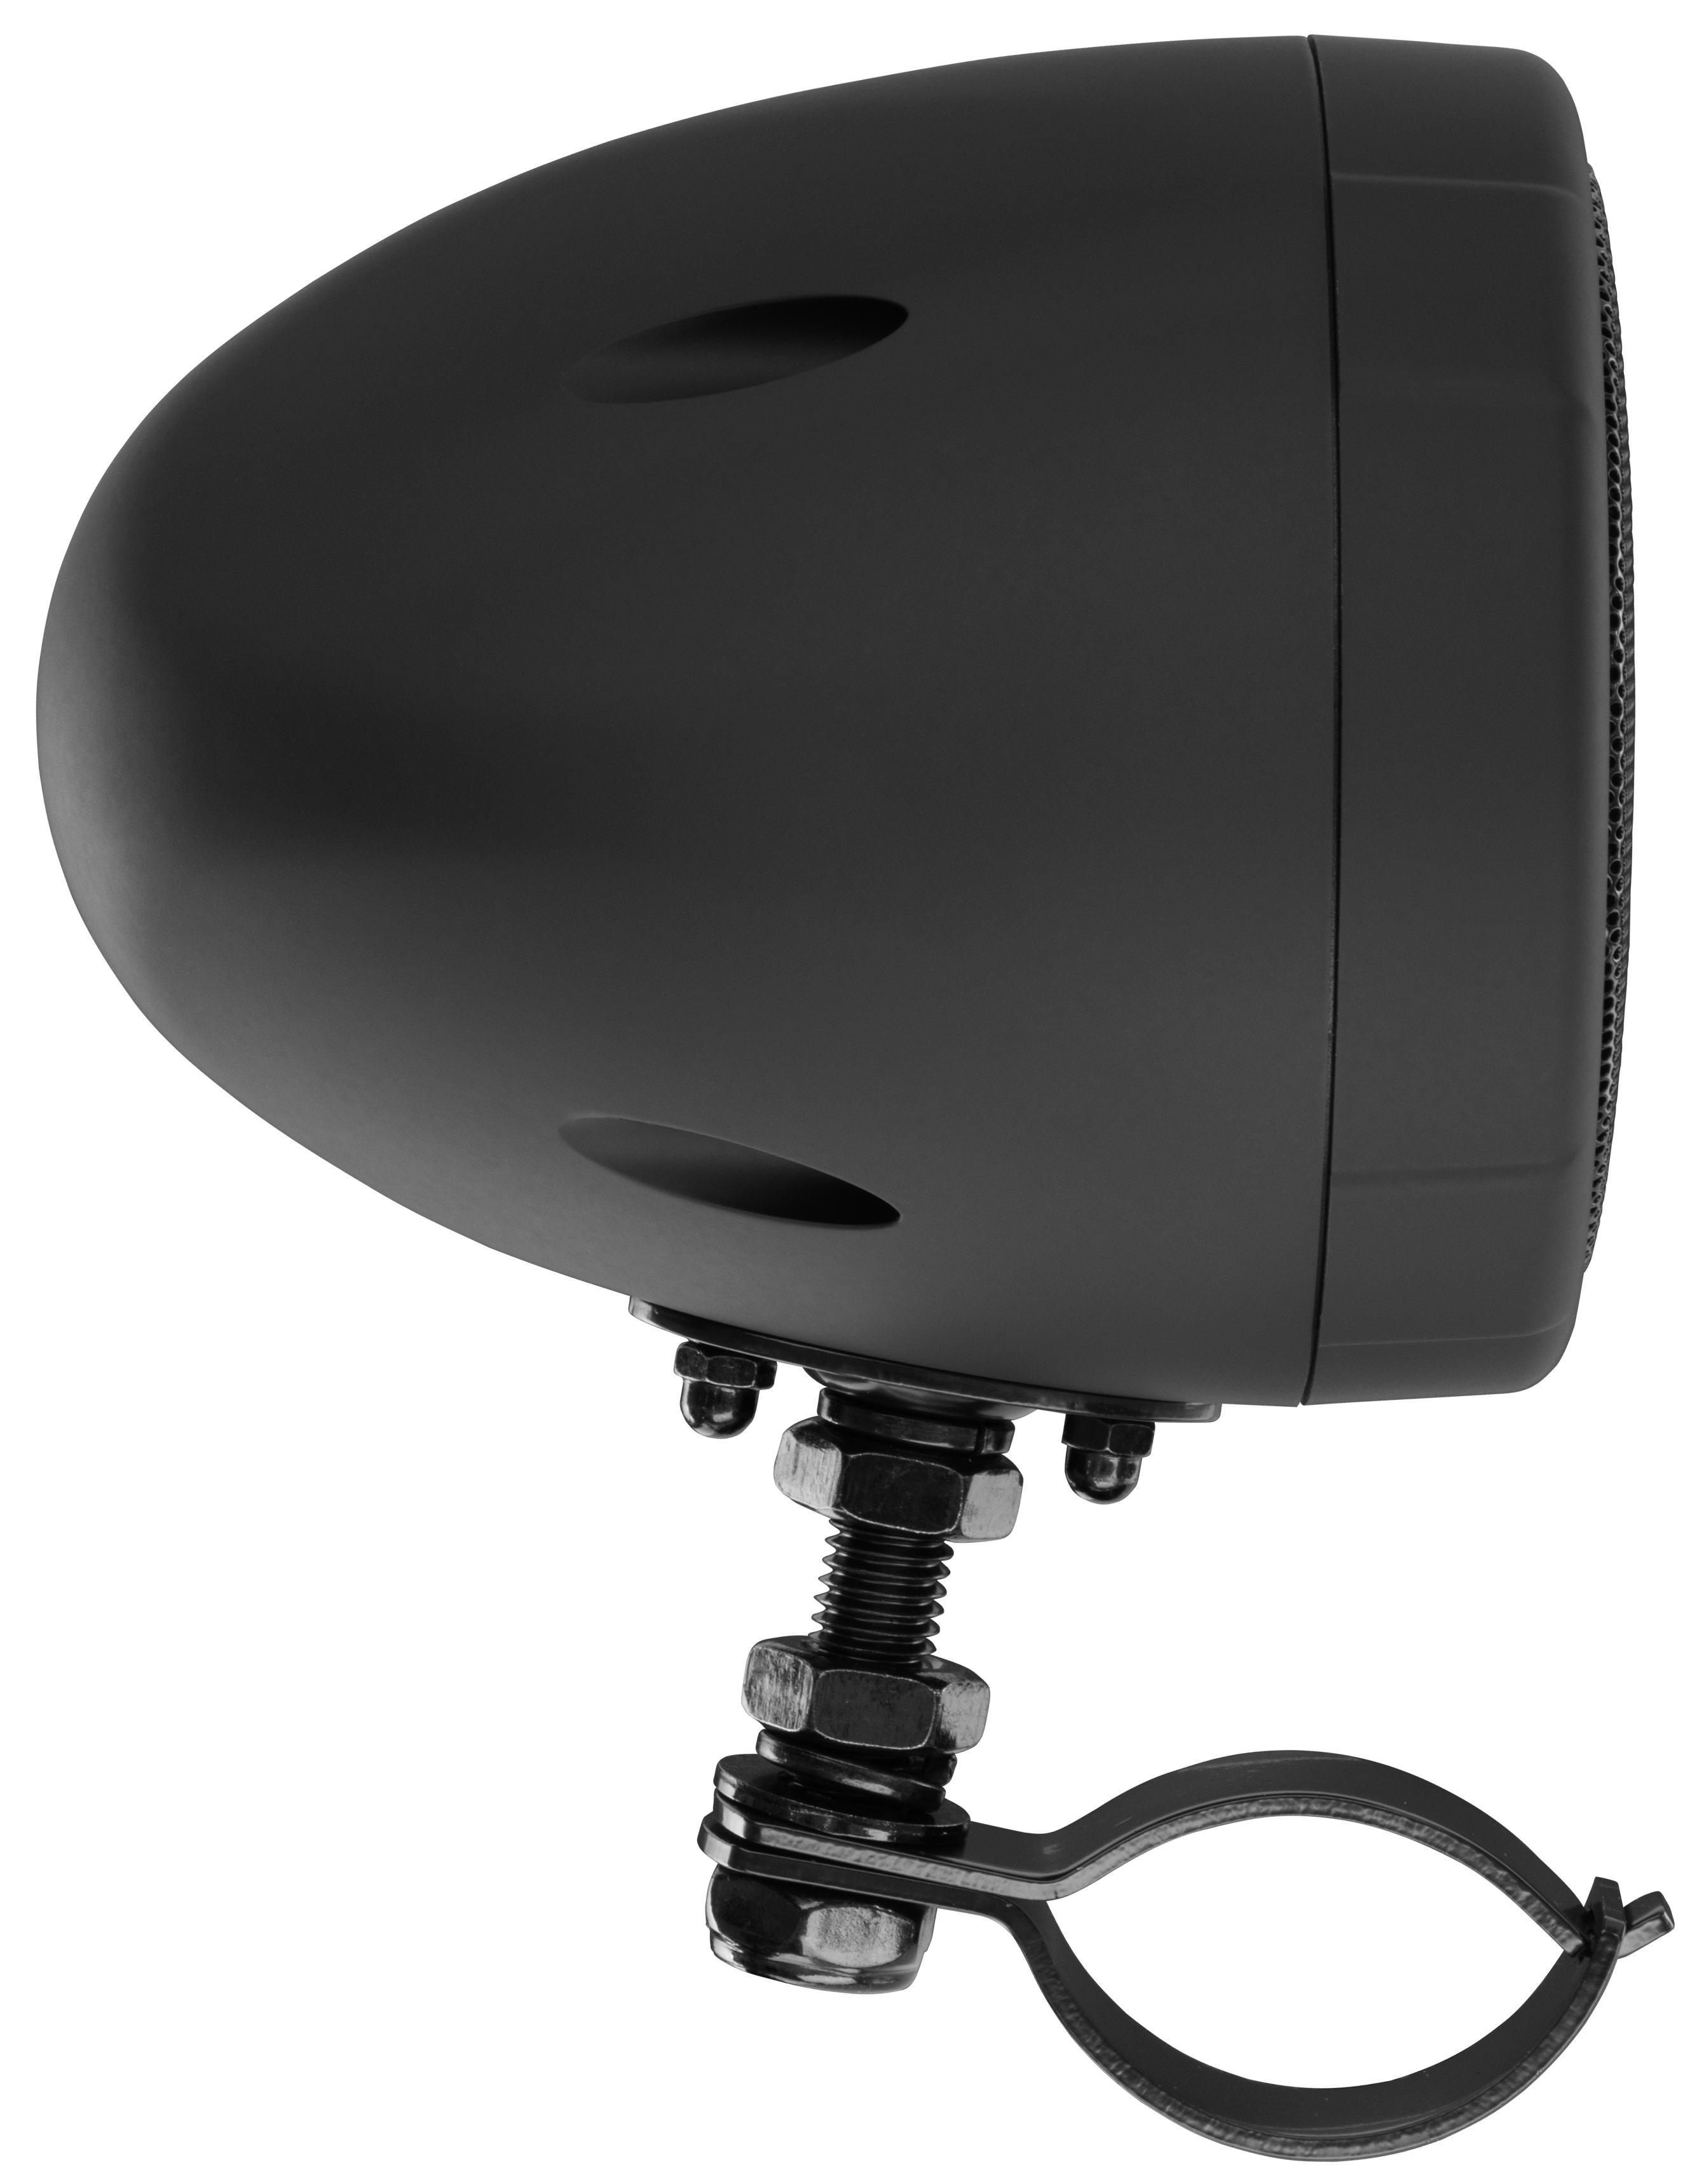 Amazon.com: BOSS AUDIO MCBK470B Black 1000 watt Motorcycle/ATV Sound System with Bluetooth Audio ...